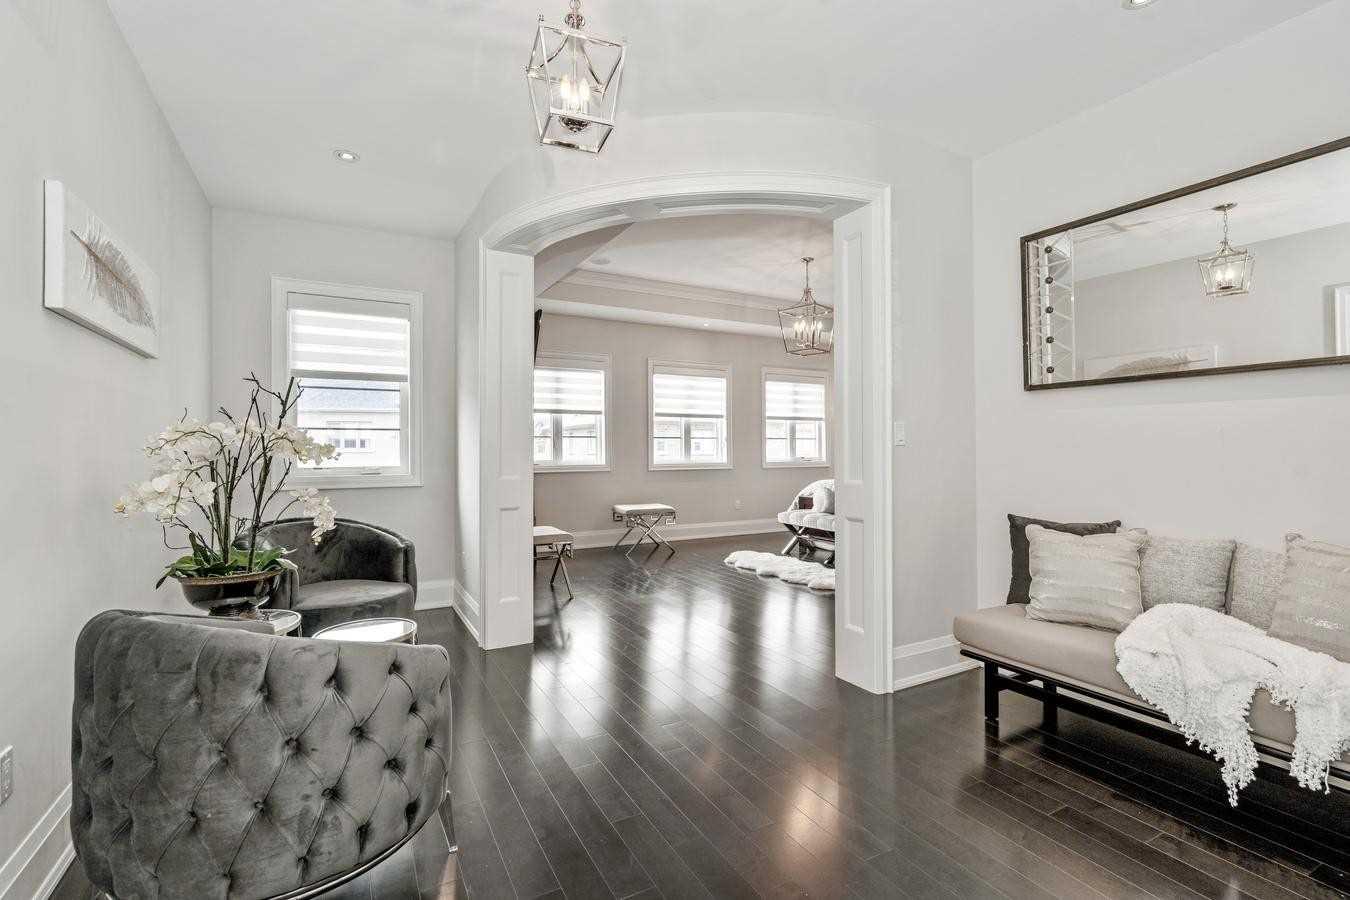 175 Port Royal Ave, Vaughan, Ontario L4H3X5, 4 Bedrooms Bedrooms, 10 Rooms Rooms,5 BathroomsBathrooms,Detached,For Sale,Port Royal,N5354457